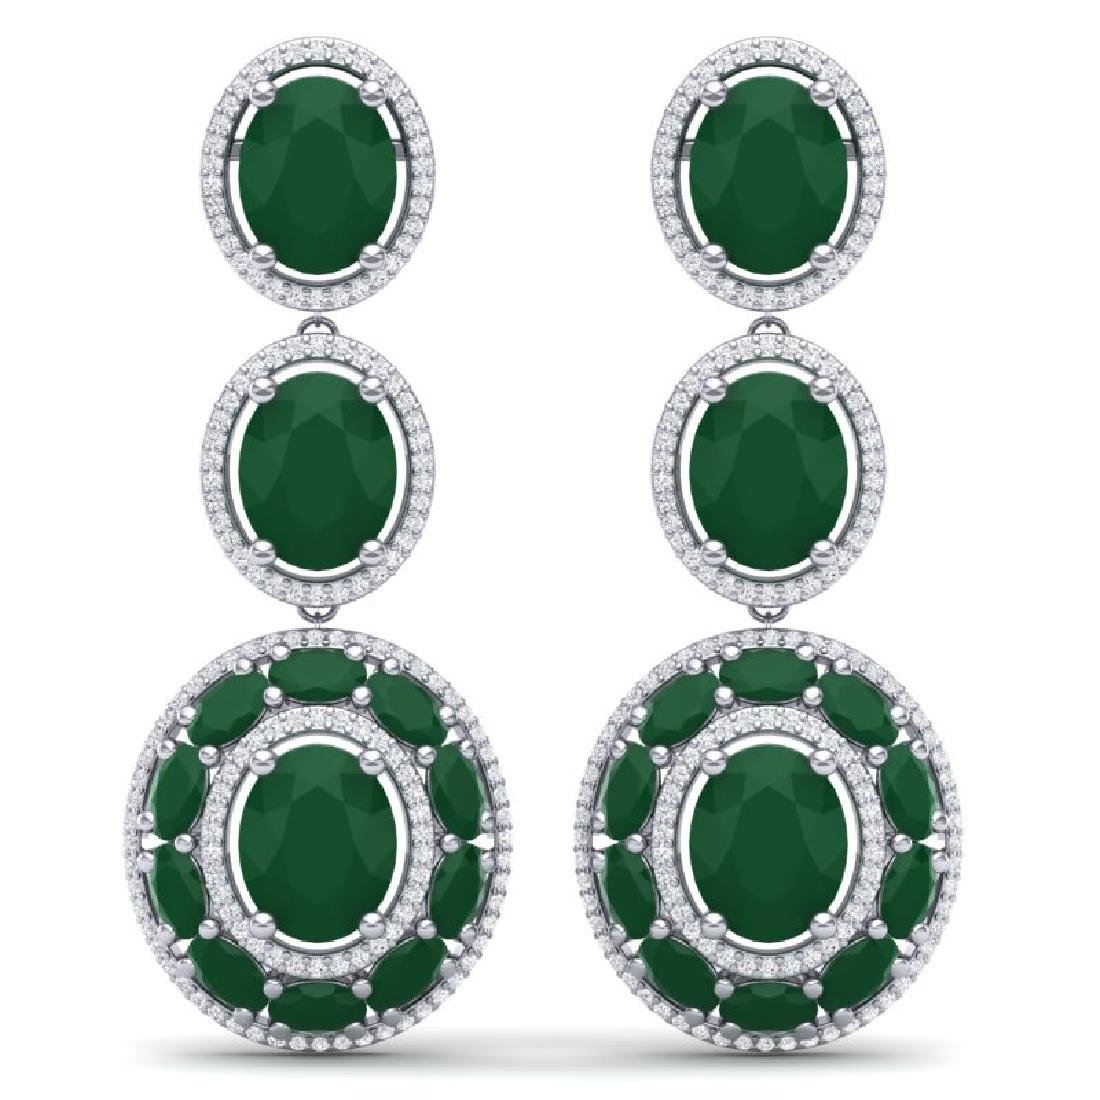 32.84 CTW Royalty Emerald & VS Diamond Earrings 18K